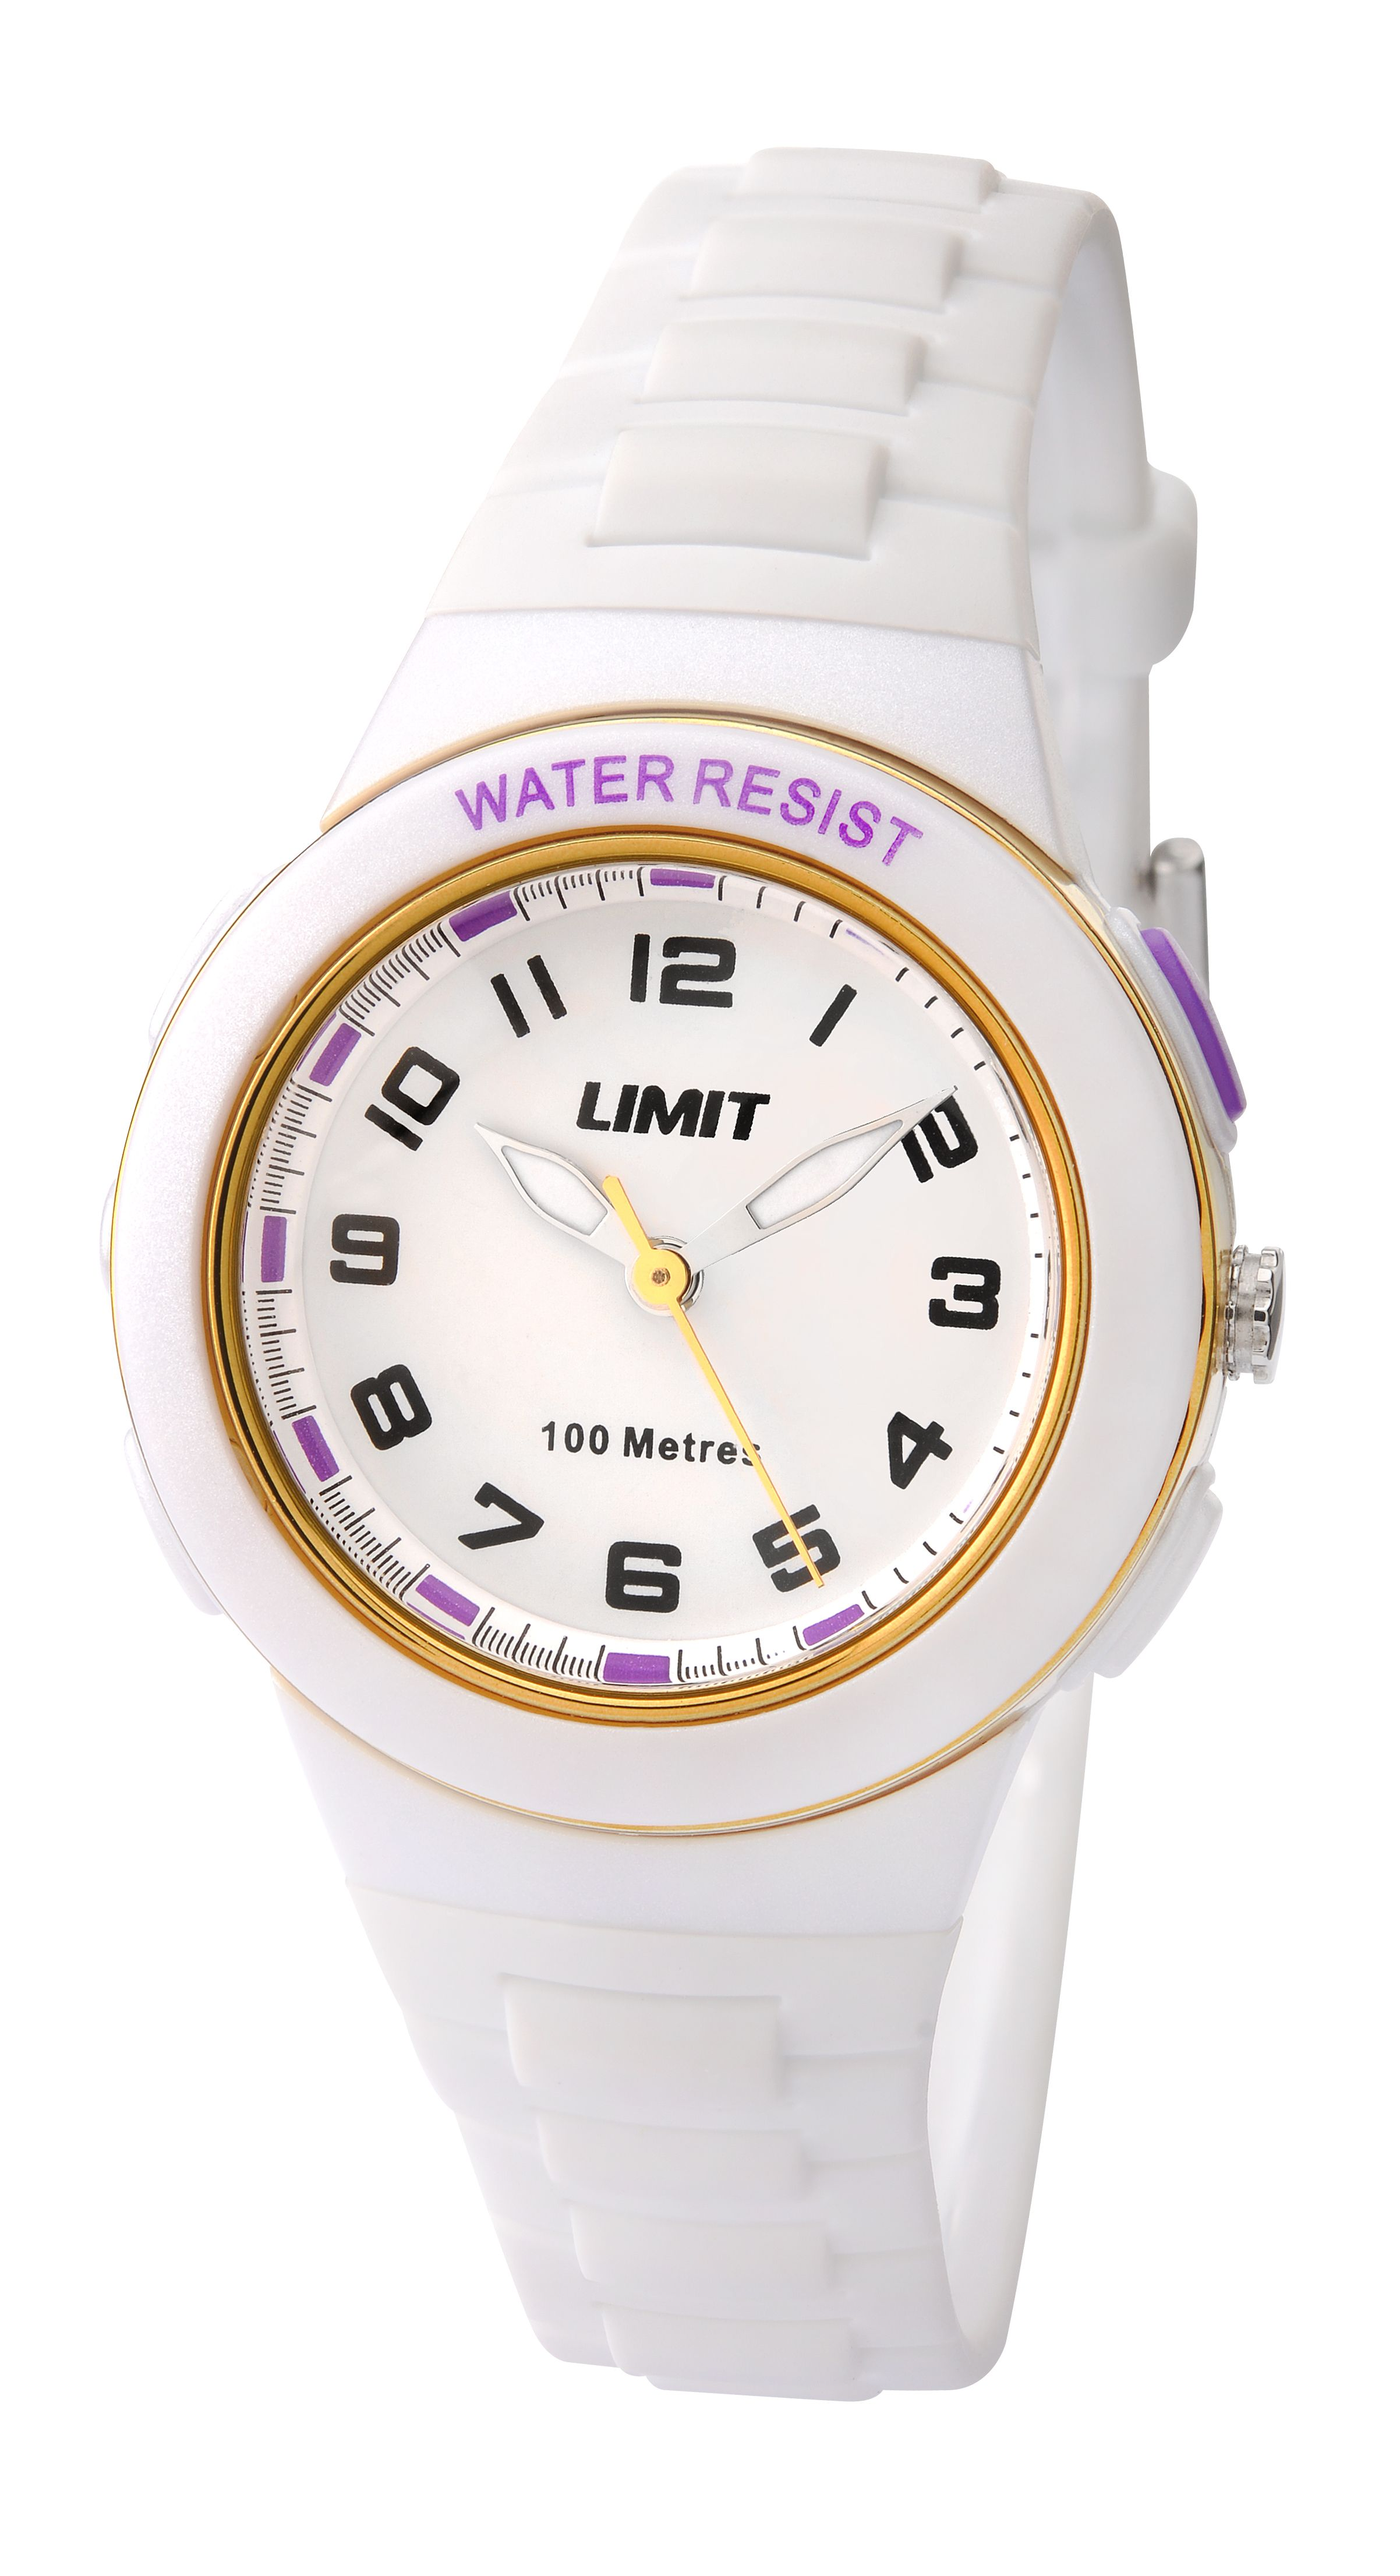 watch box legal